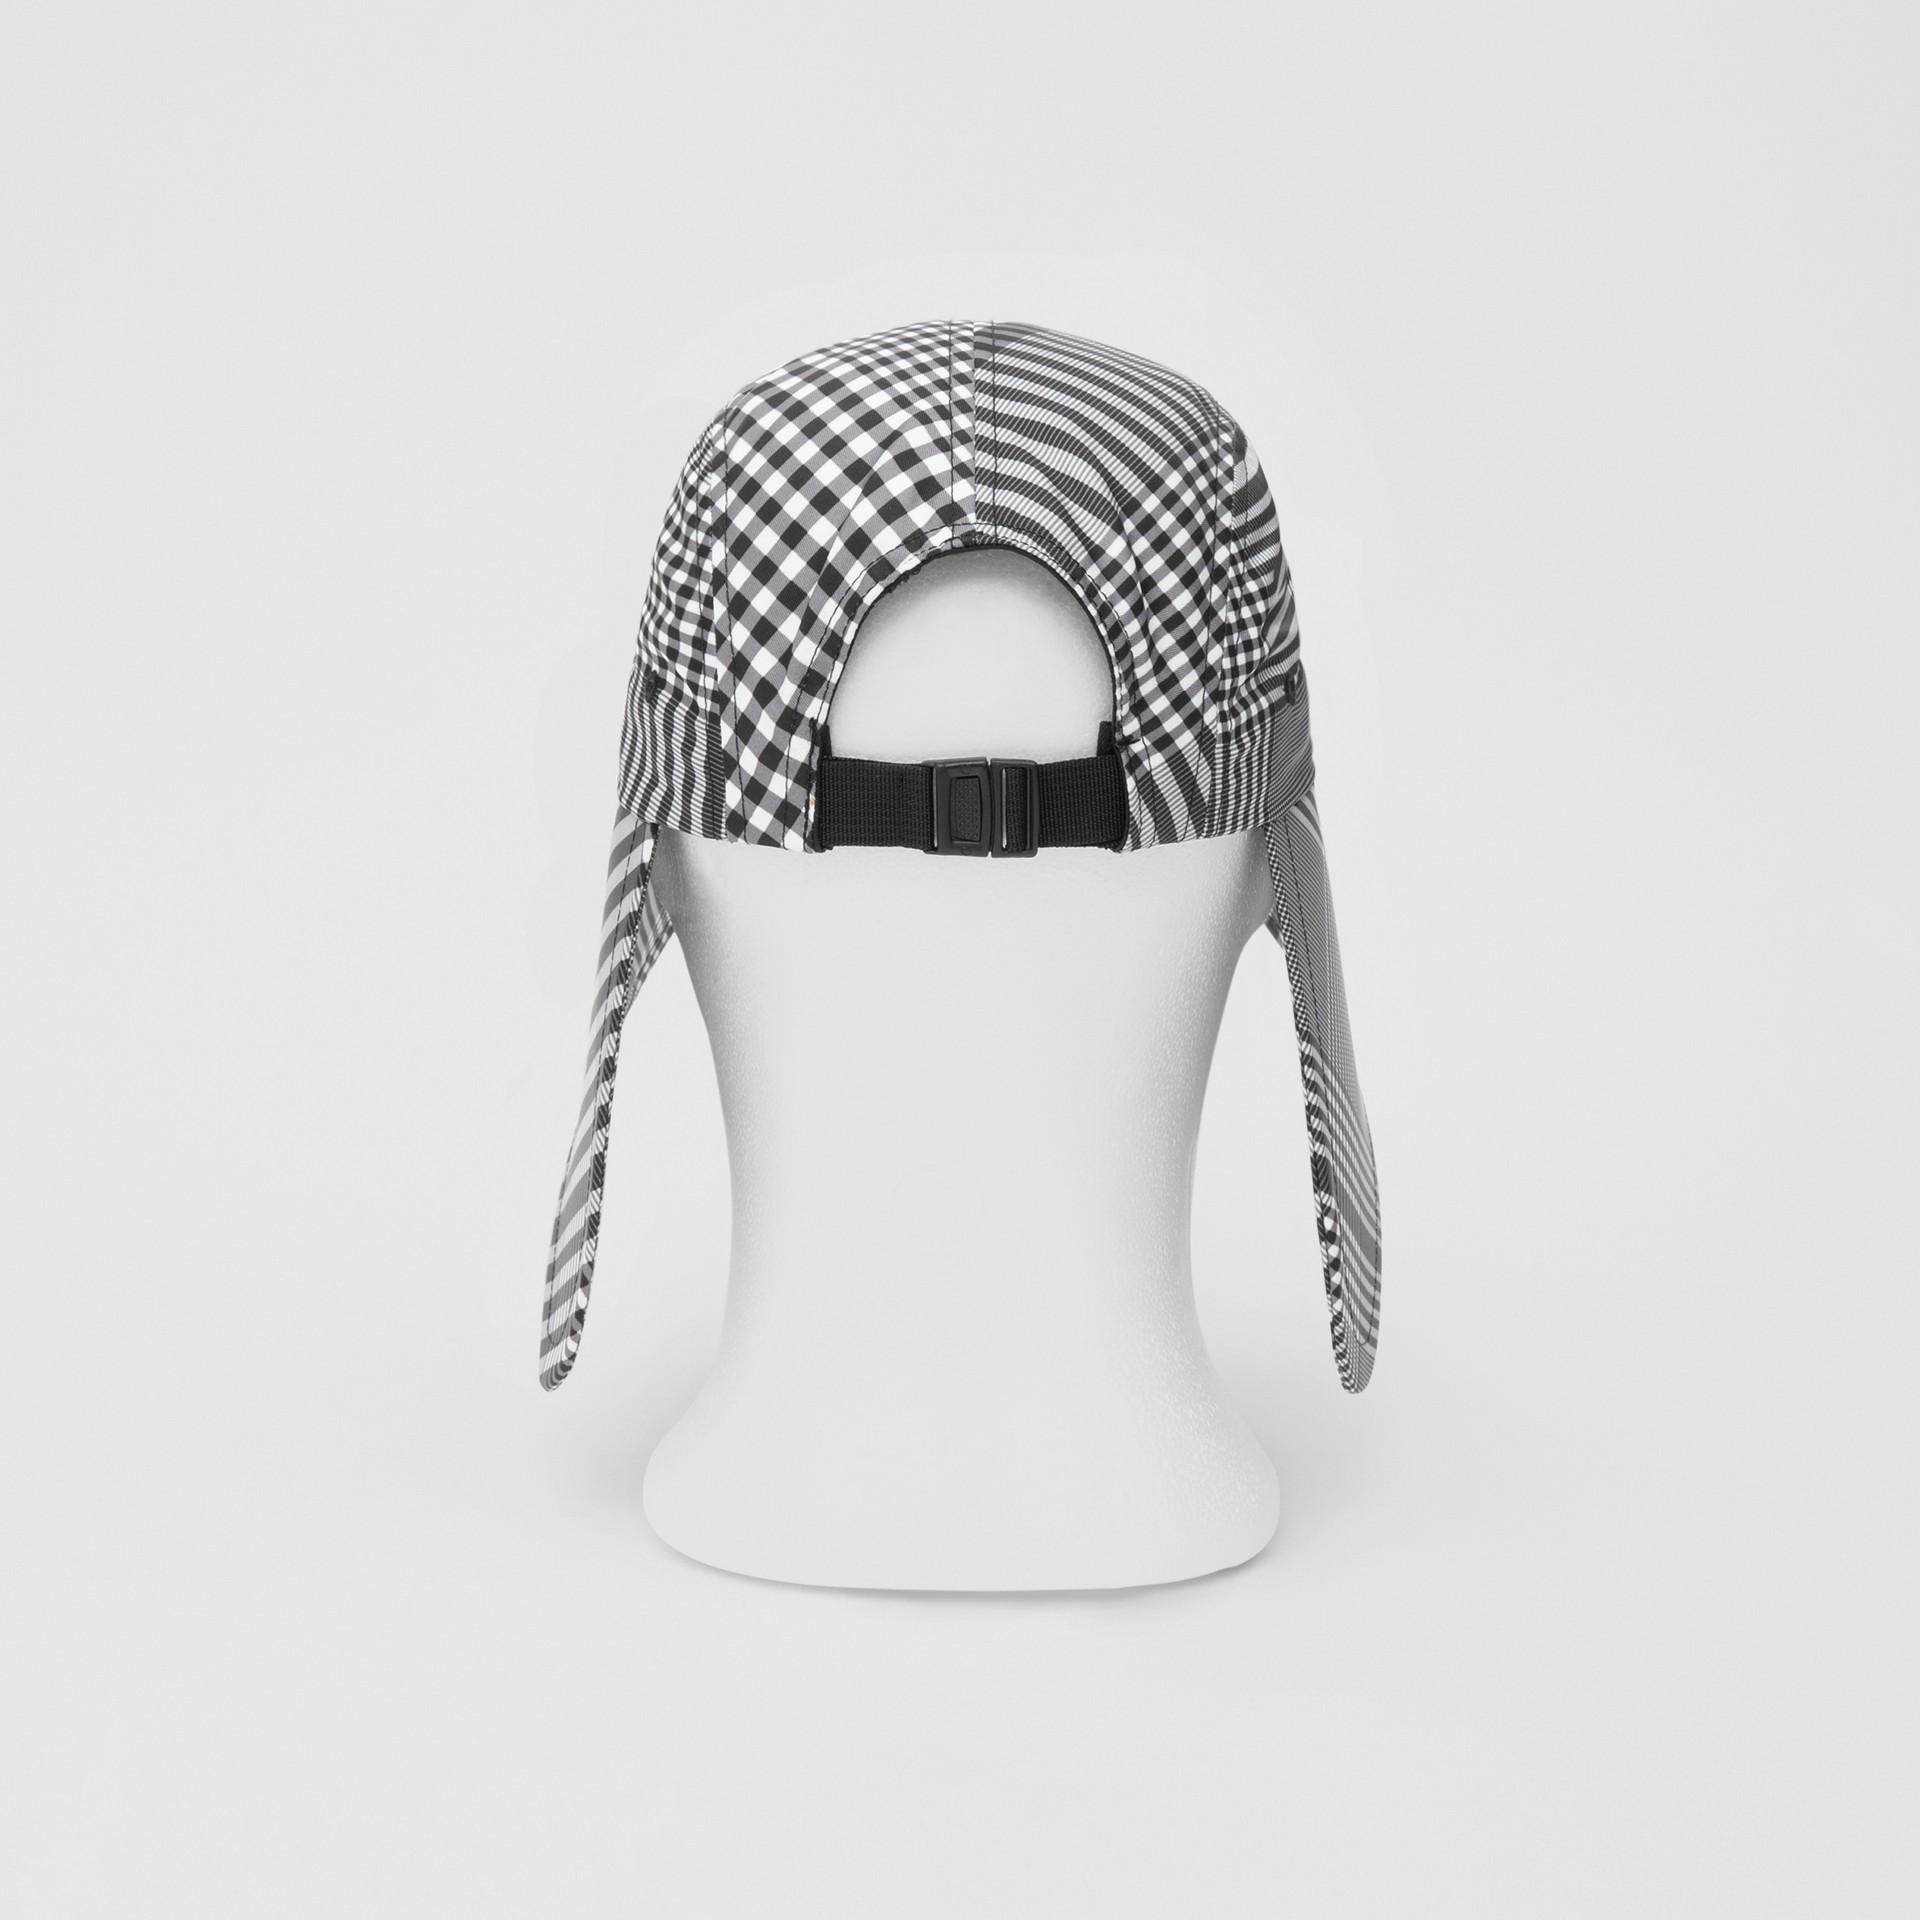 Logo Appliqué Check Bonnet Cap in Black/white | Burberry United Kingdom - gallery image 8